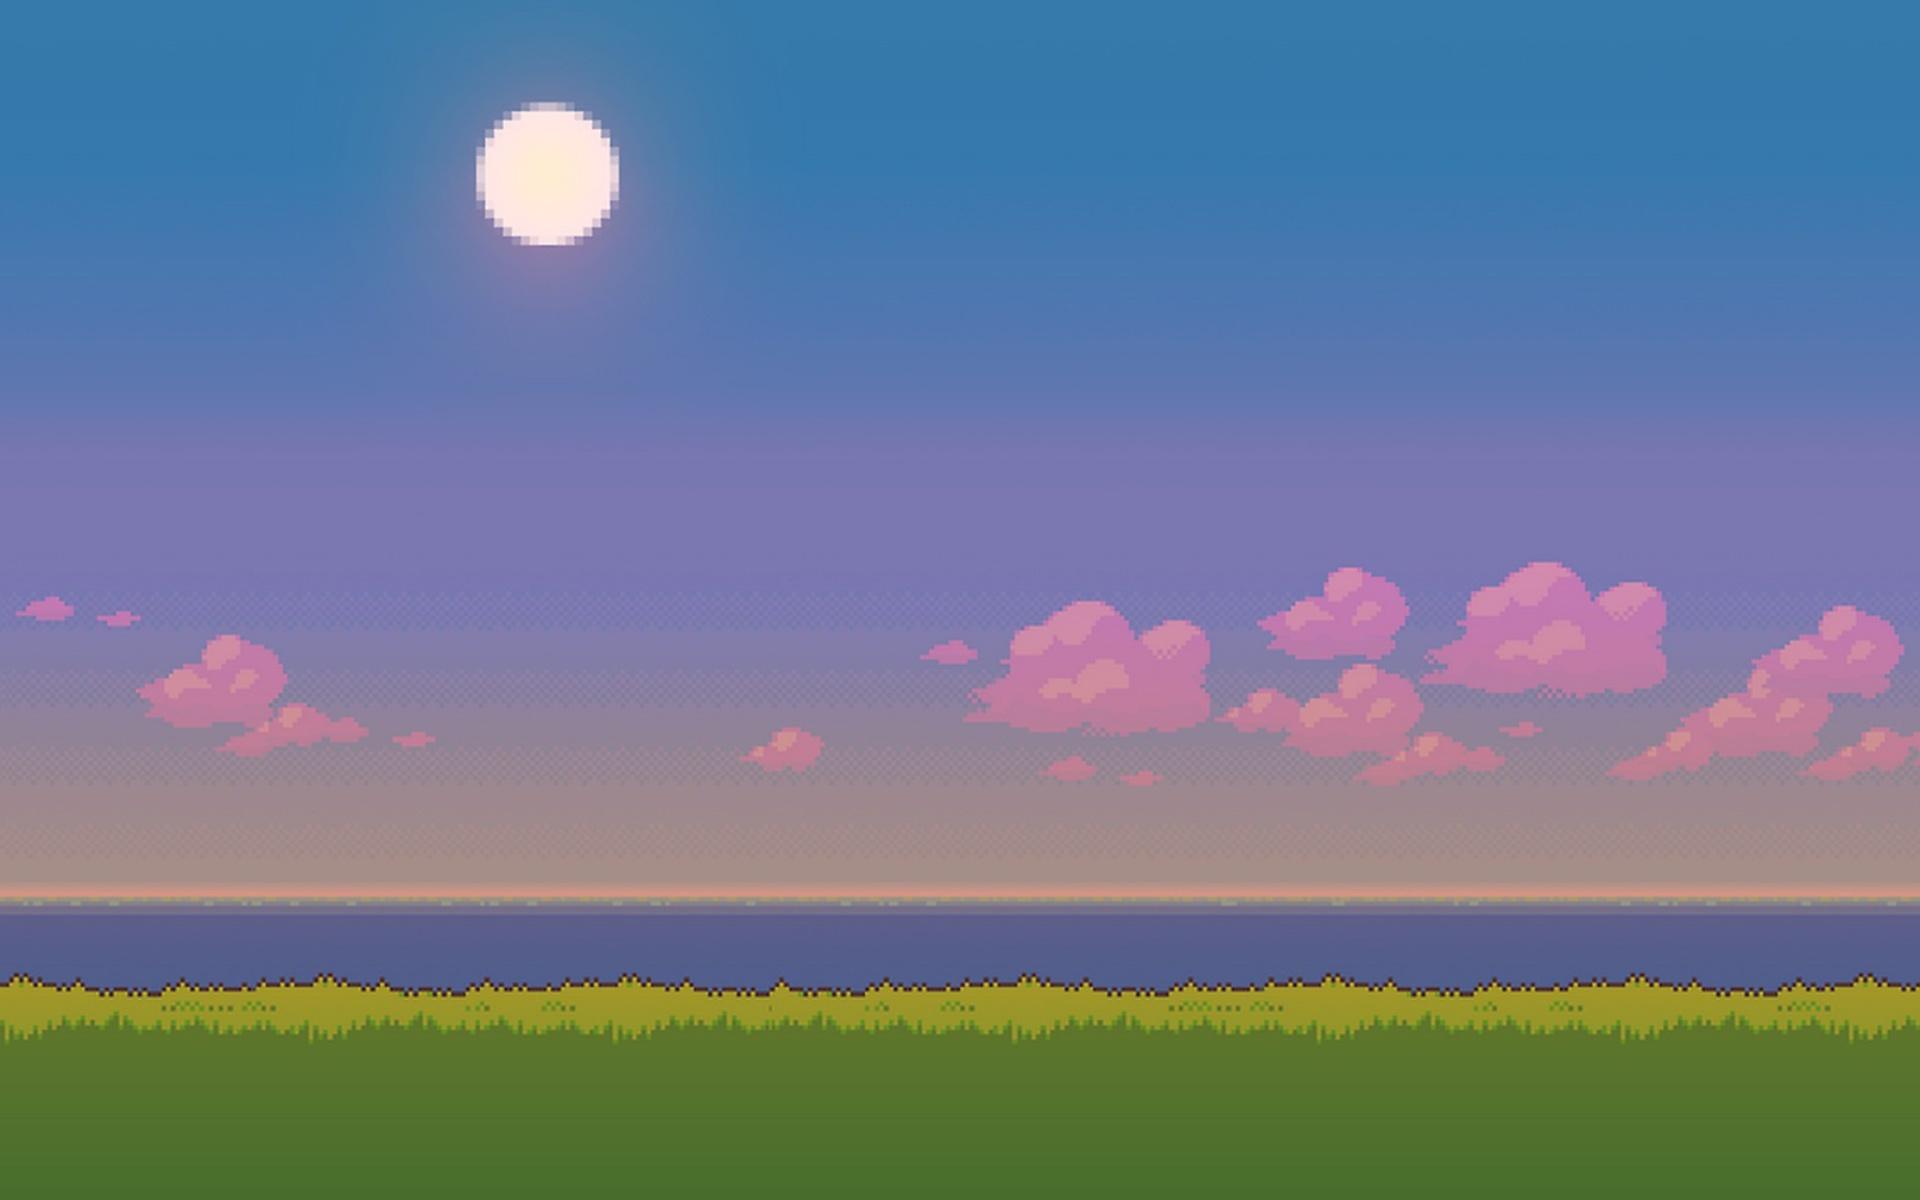 Pixel Art Wallpaper for 1920x1200